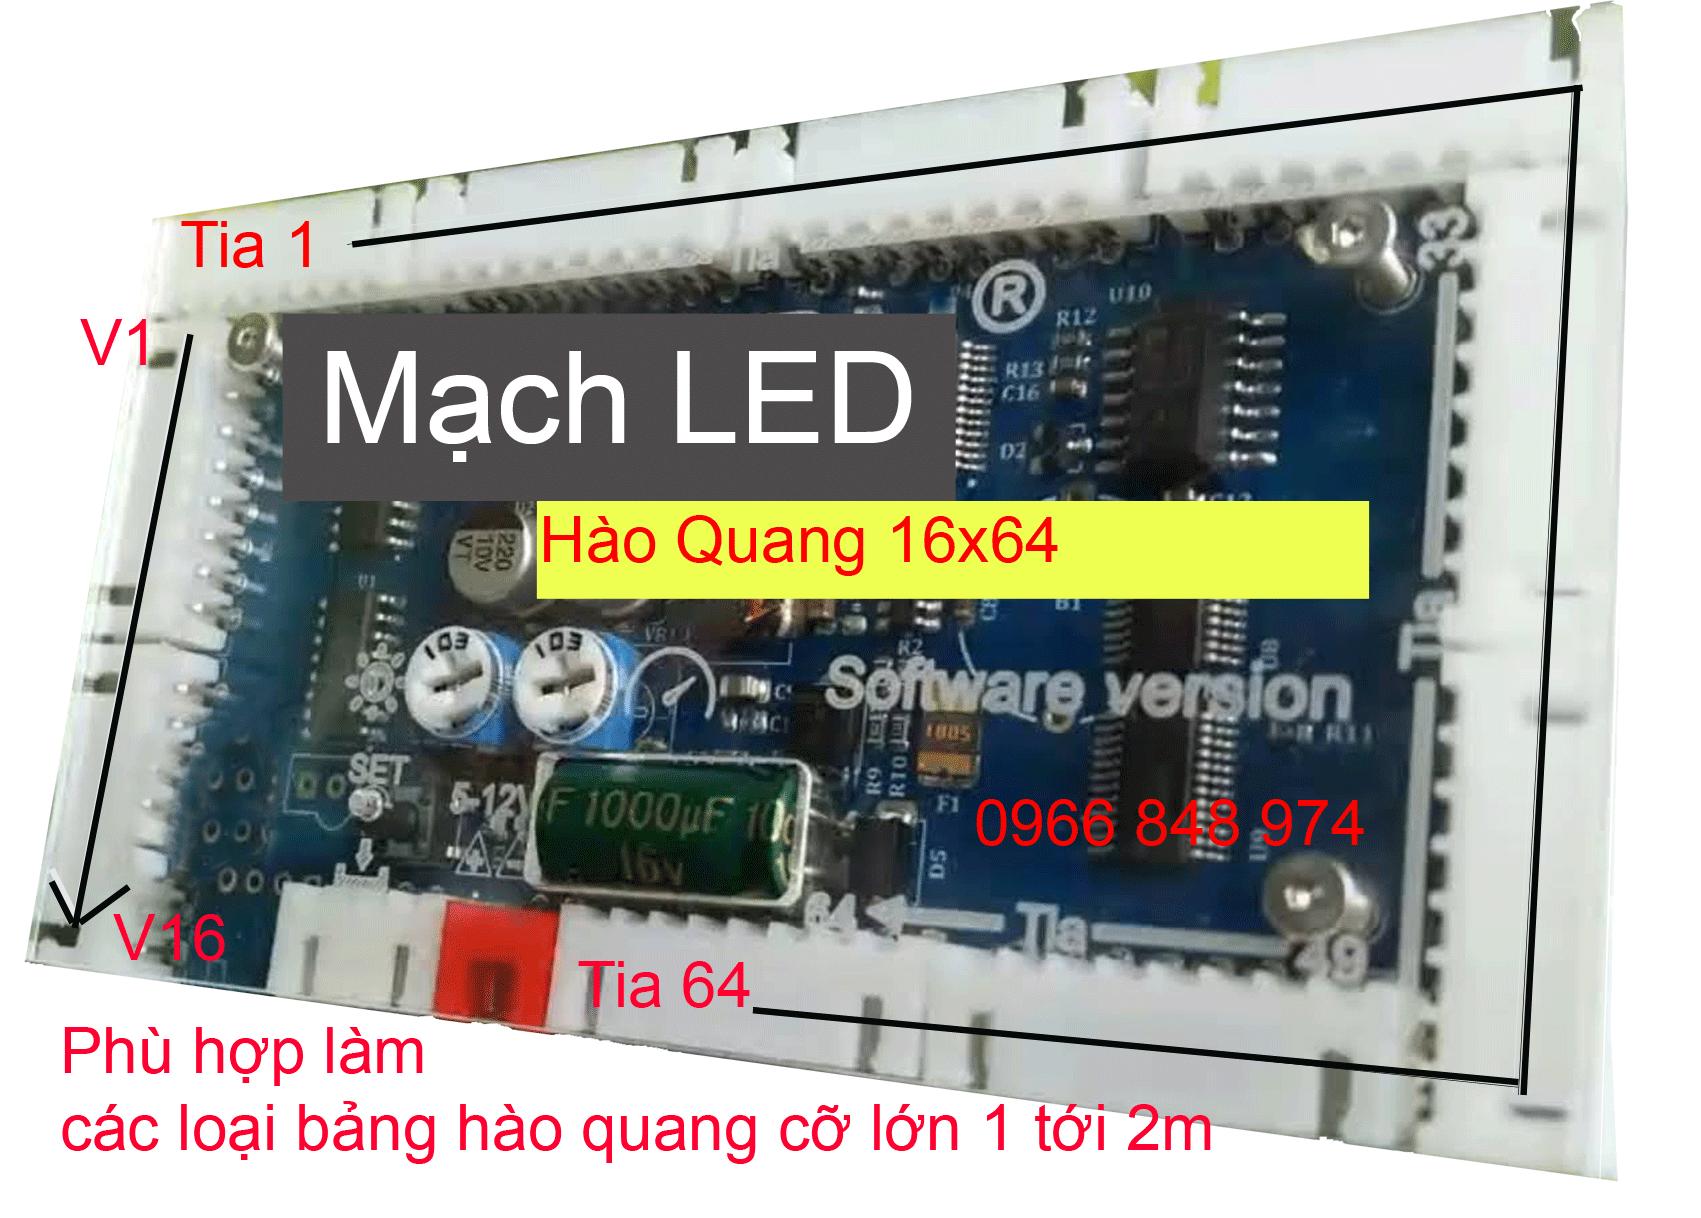 mach hao quang 16x64